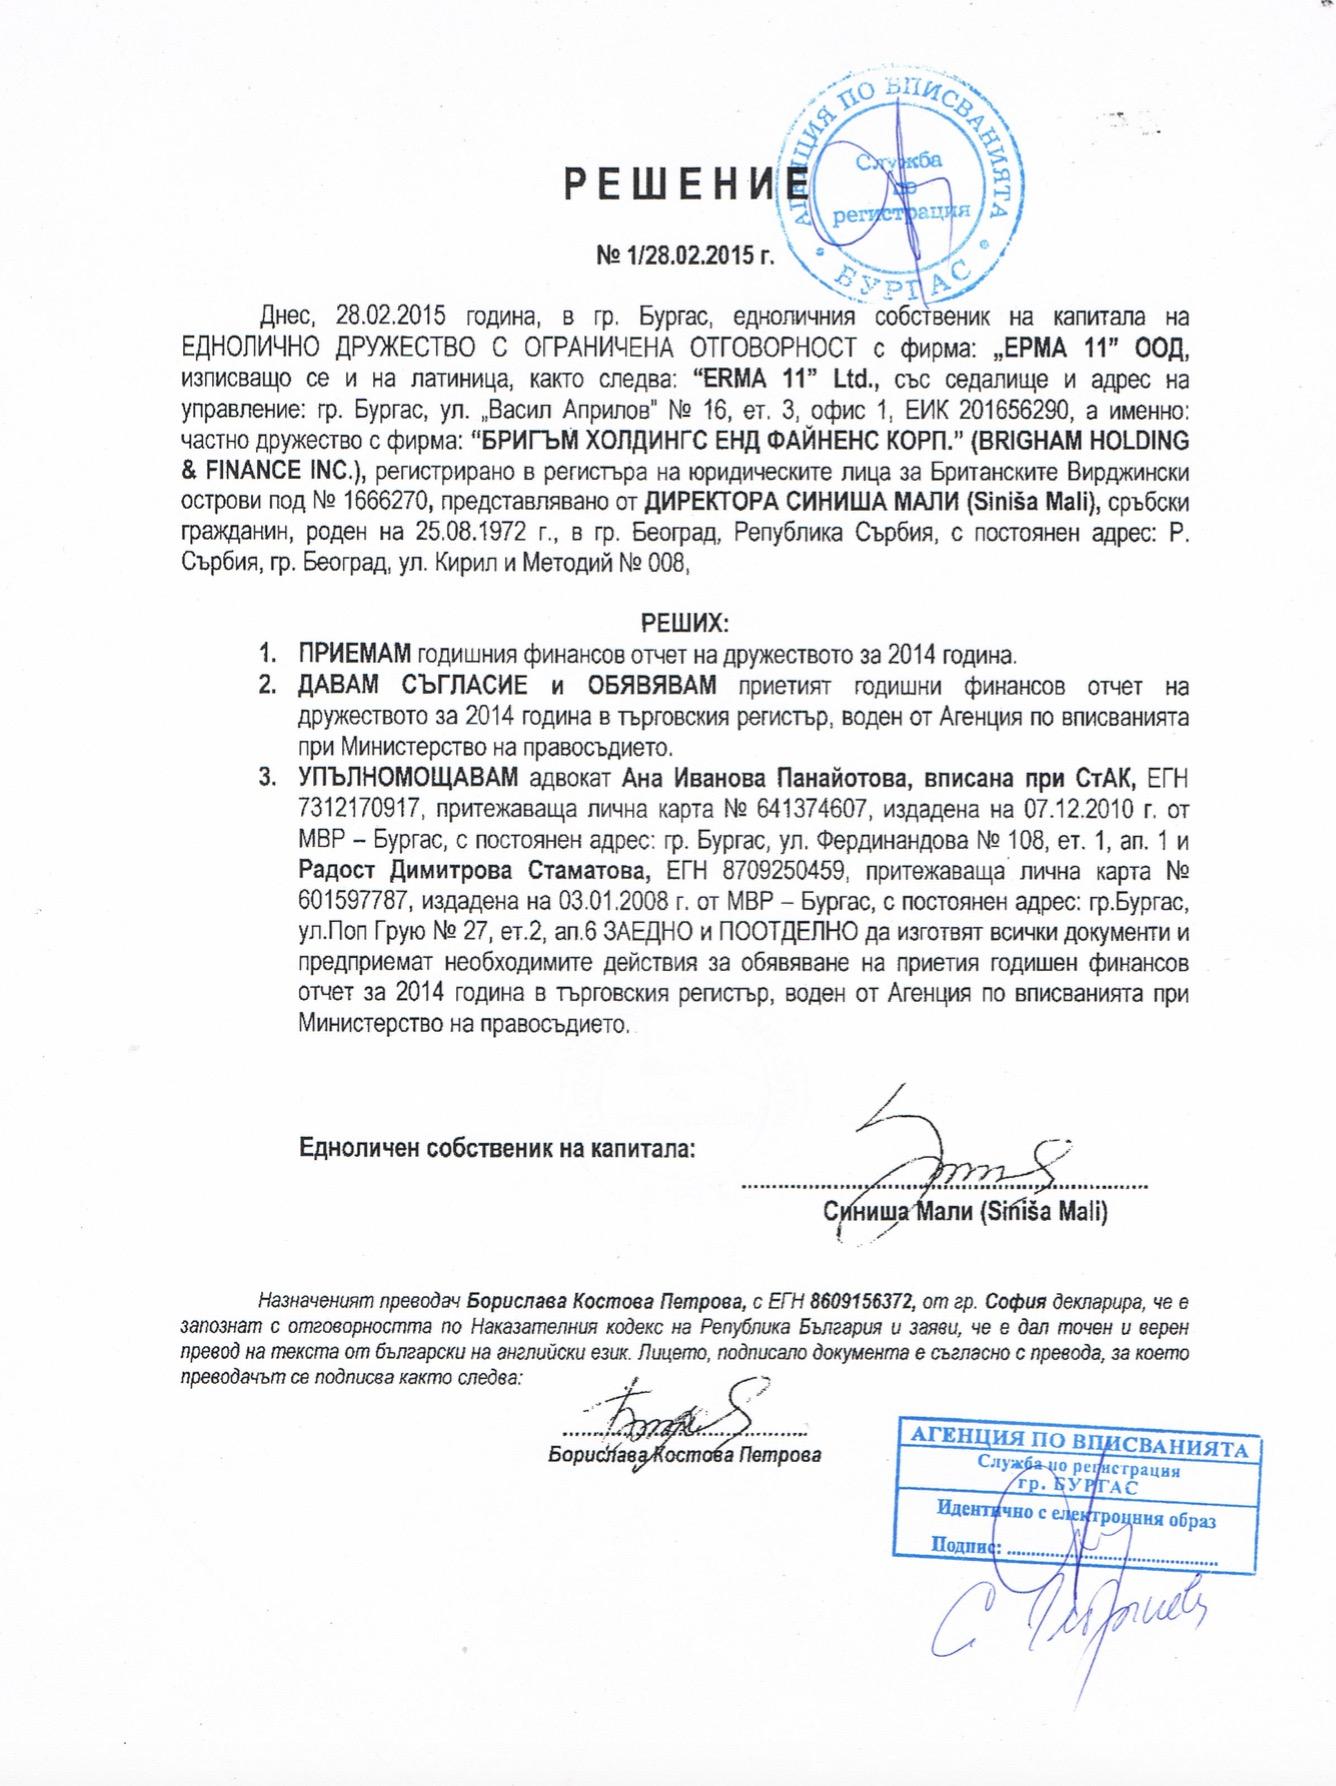 Bulgarian Commercial Register 'Hacked' because of Belgrade Mayor